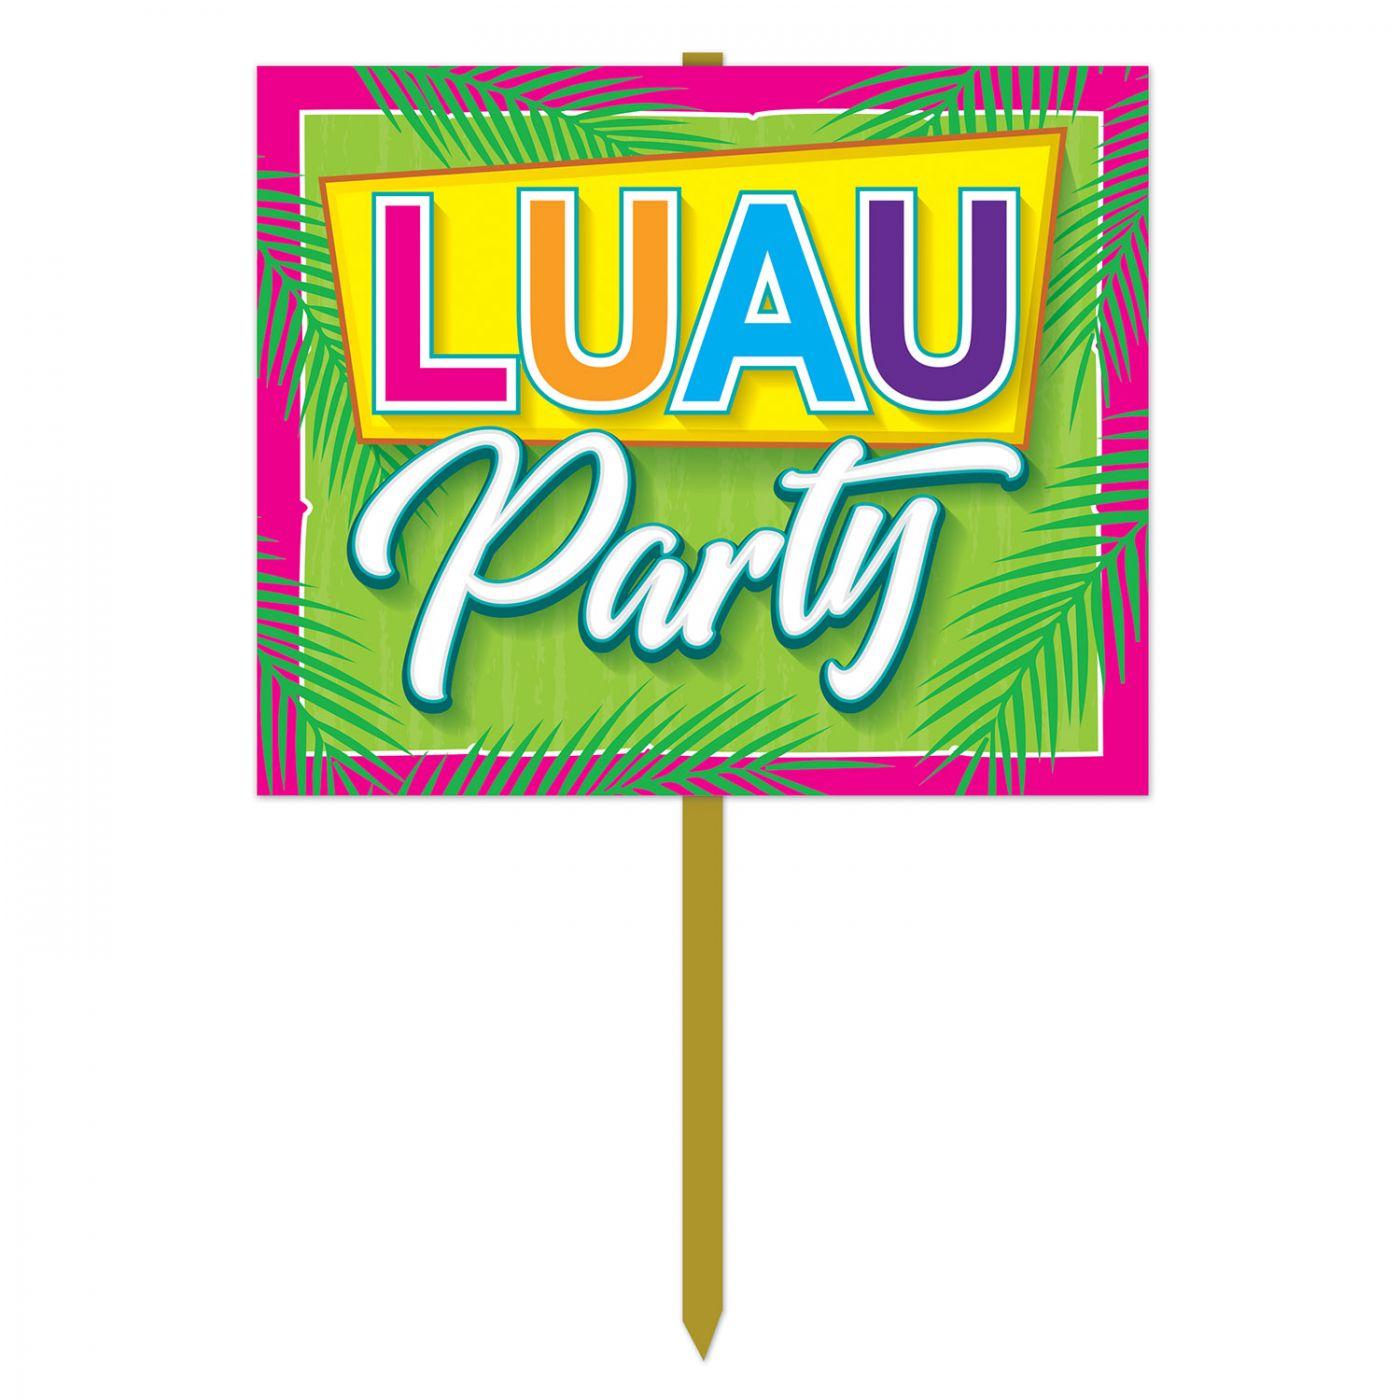 Luau Party Yard Sign image